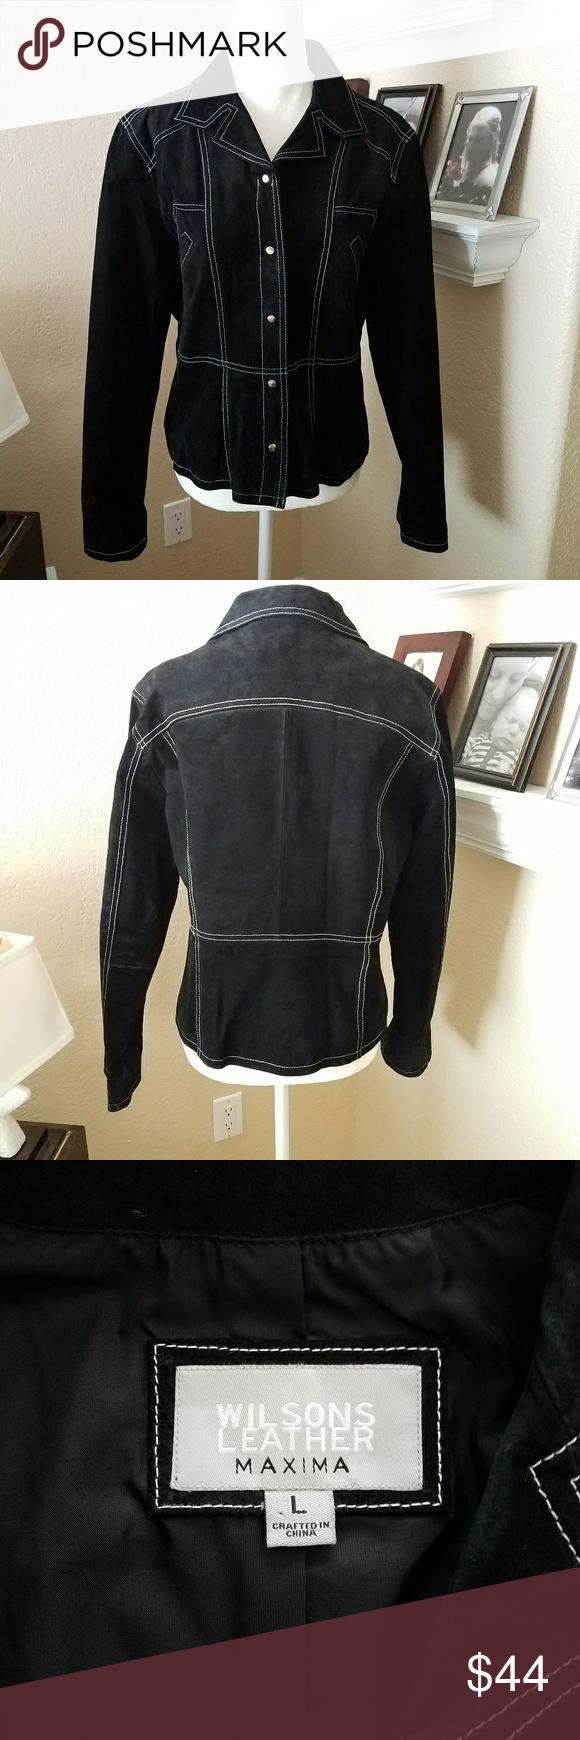 Wilson's Leather Black Suede Jacket Striking! This suede